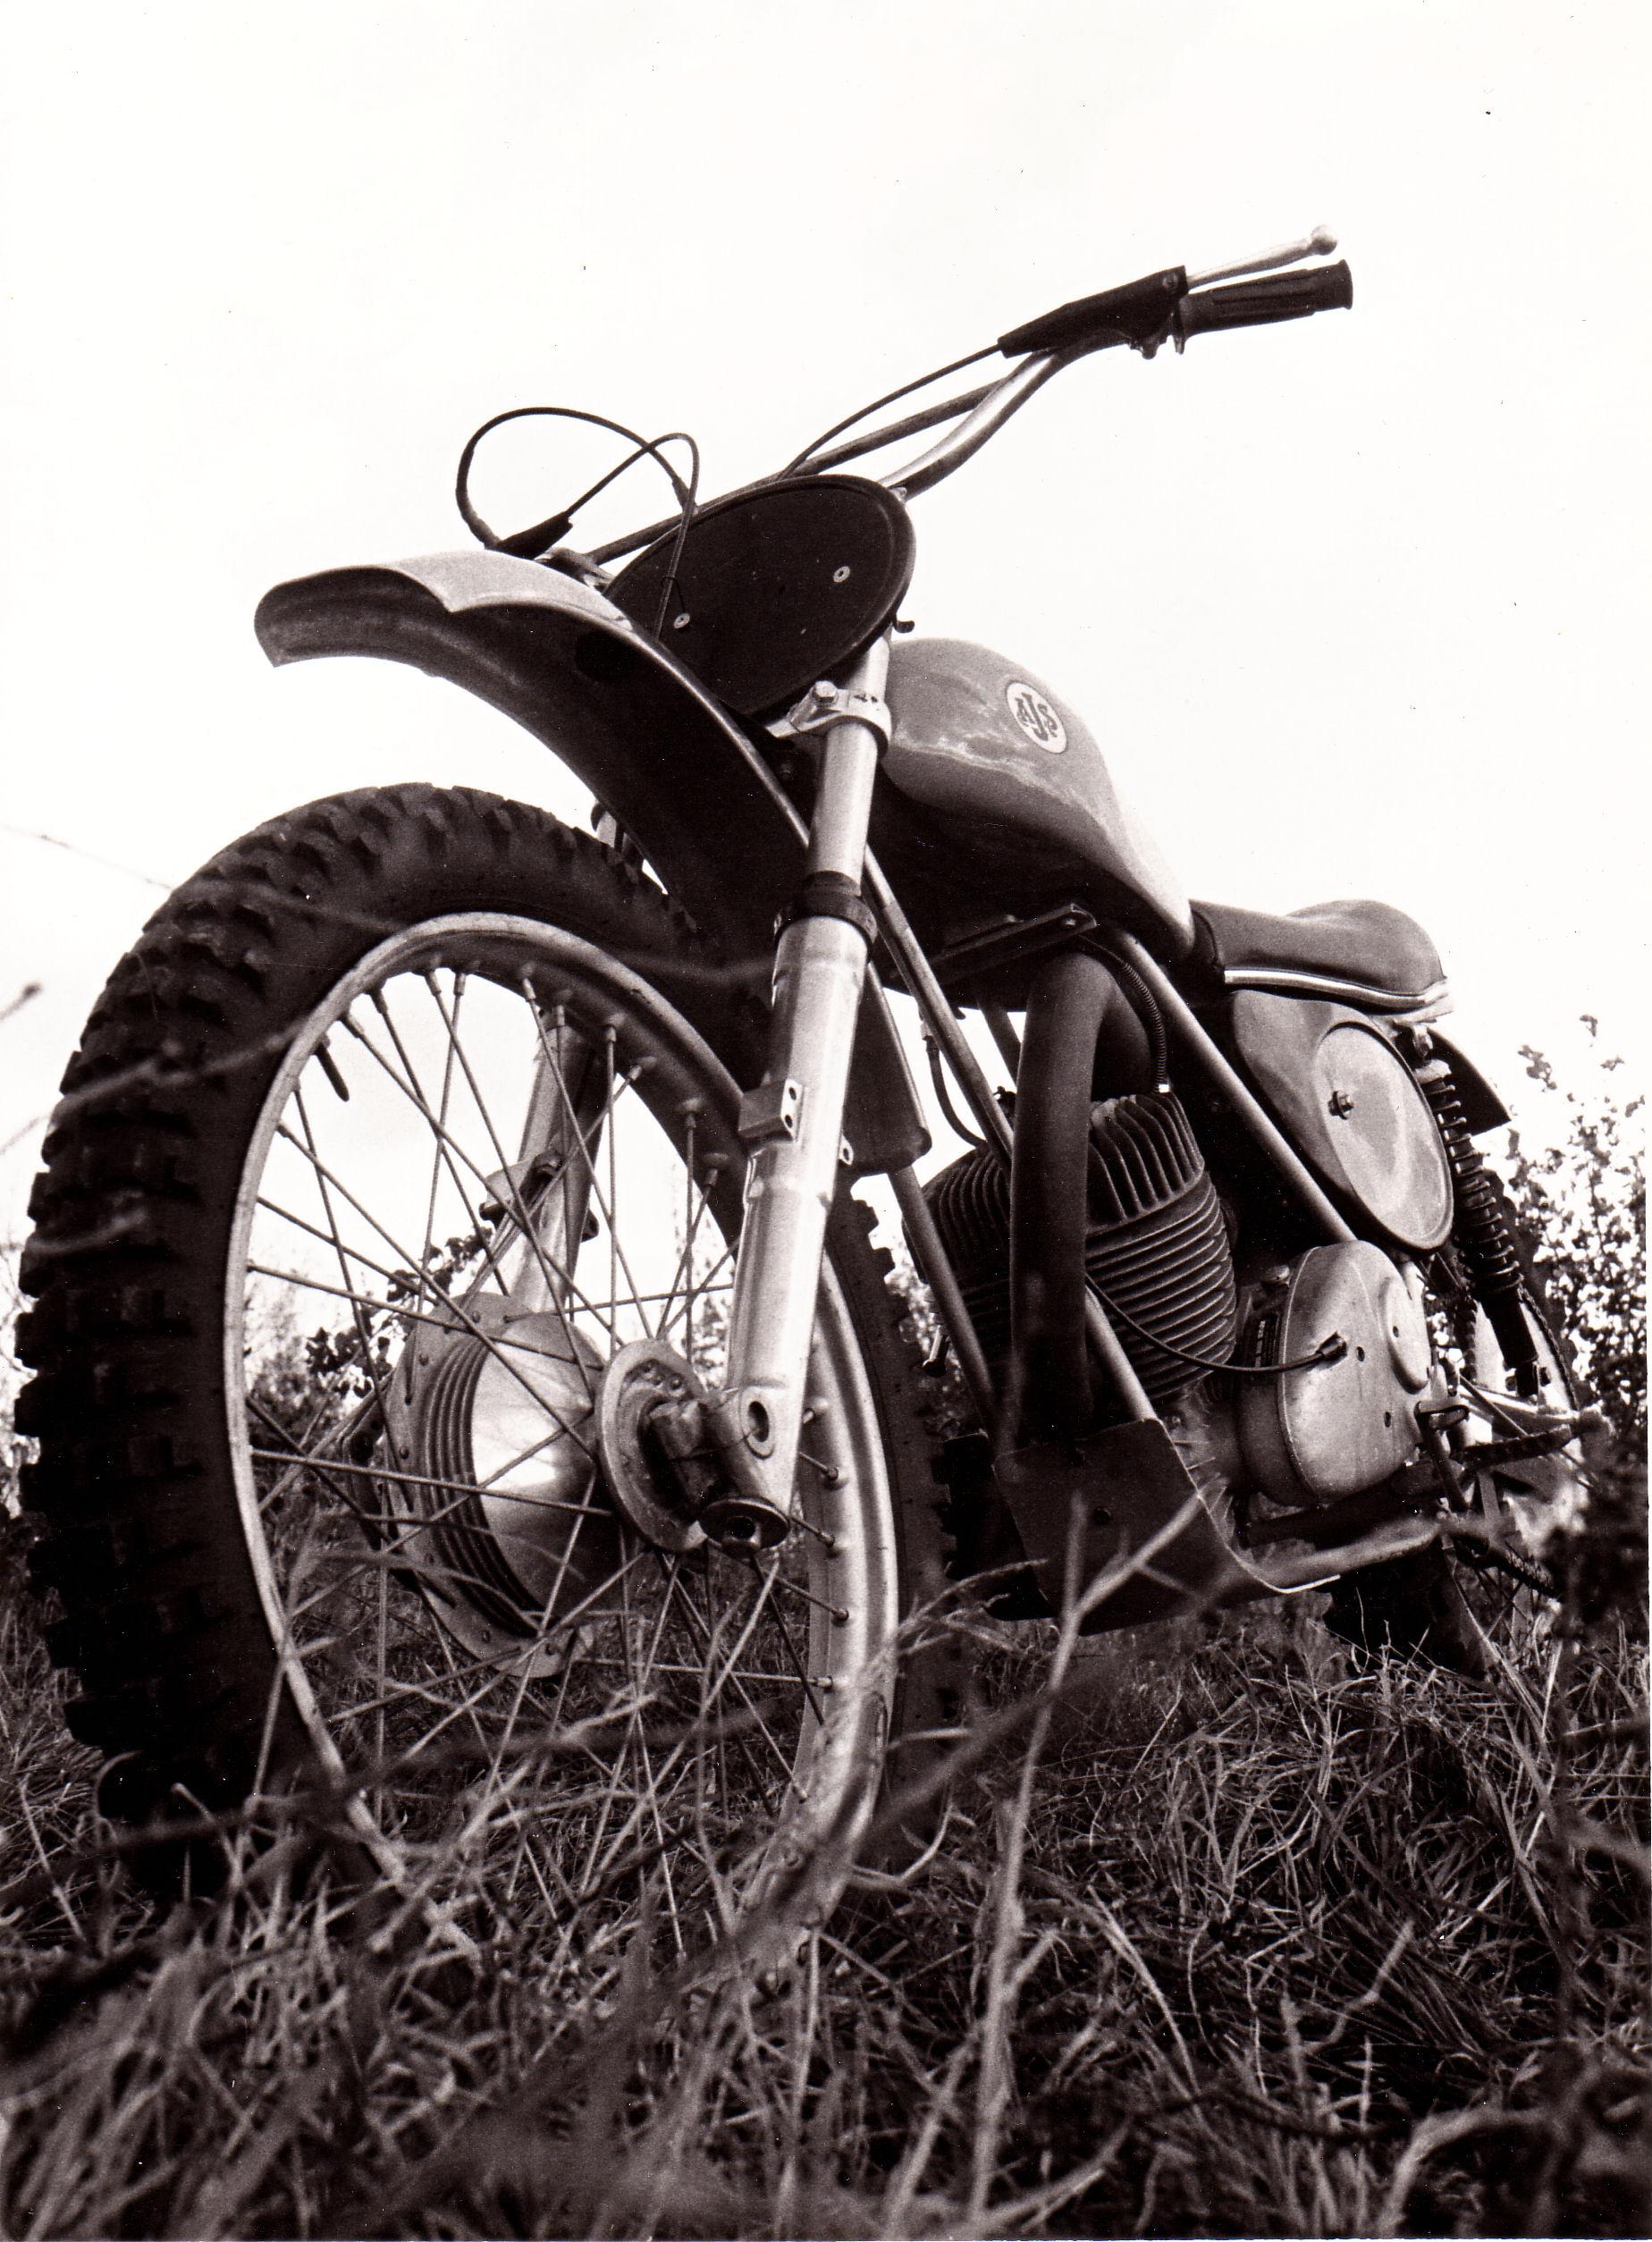 1951 international harvester l